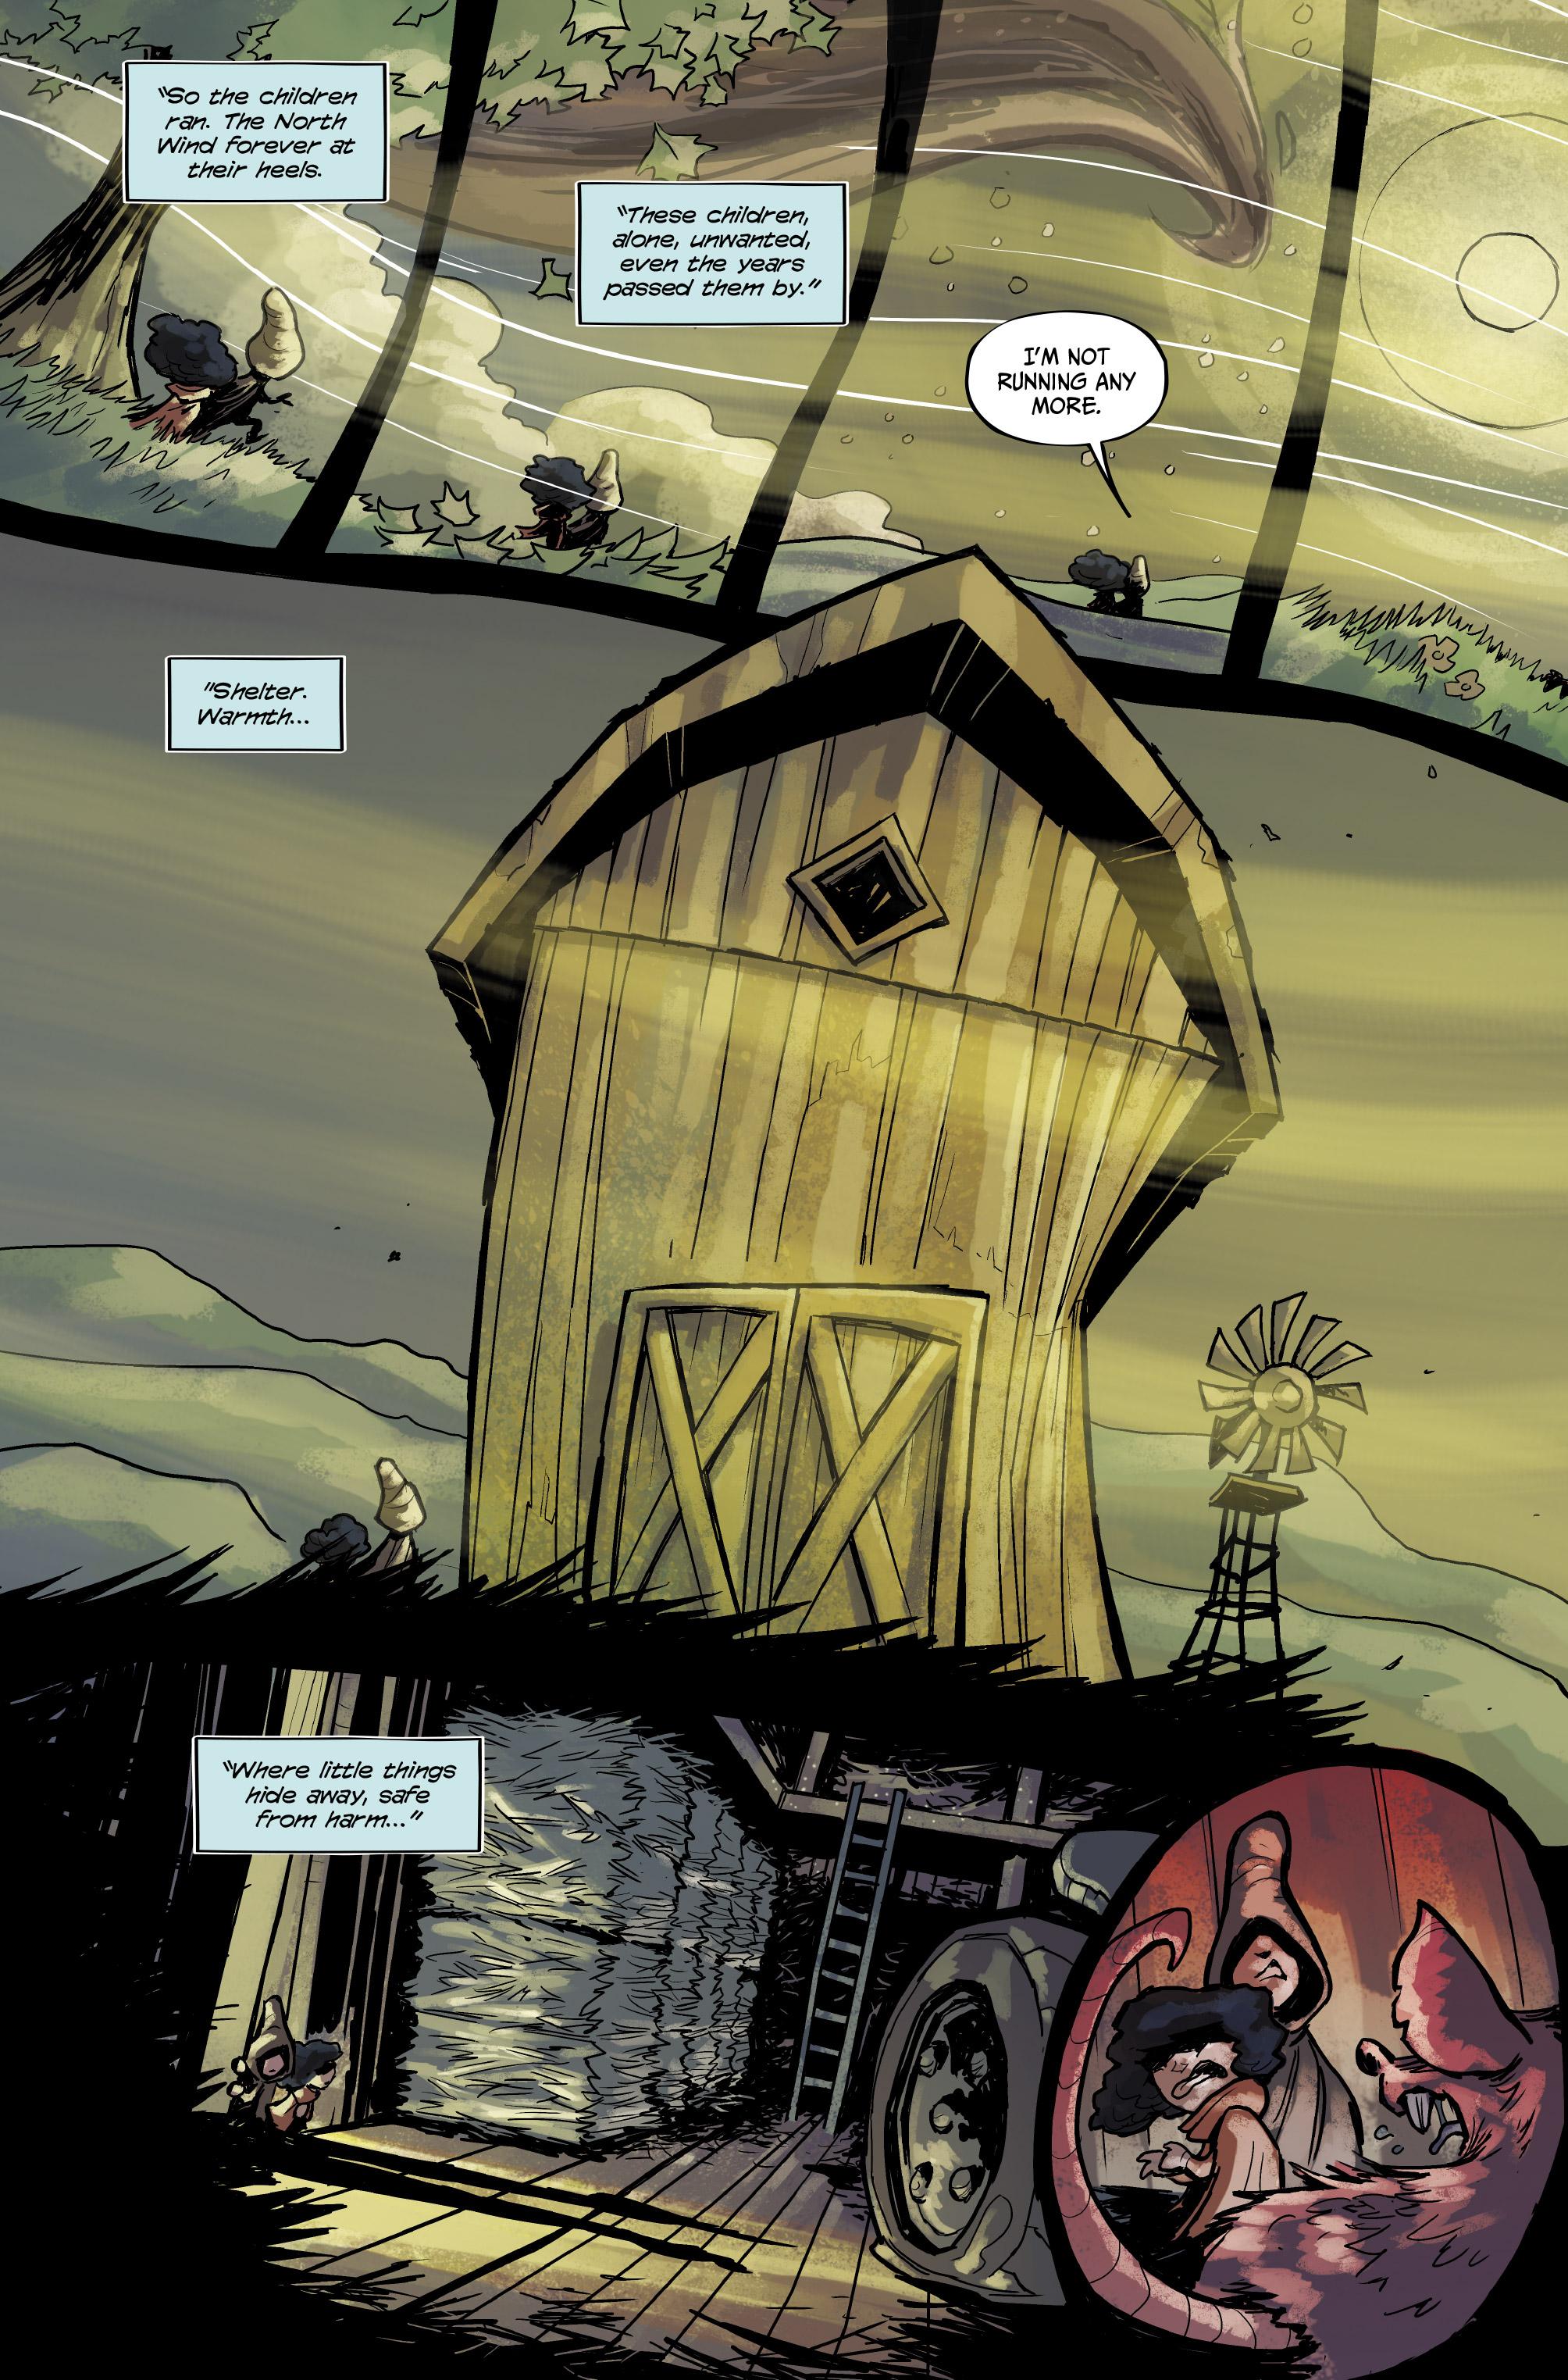 Read online Little Nightmares comic -  Issue #1 - 16